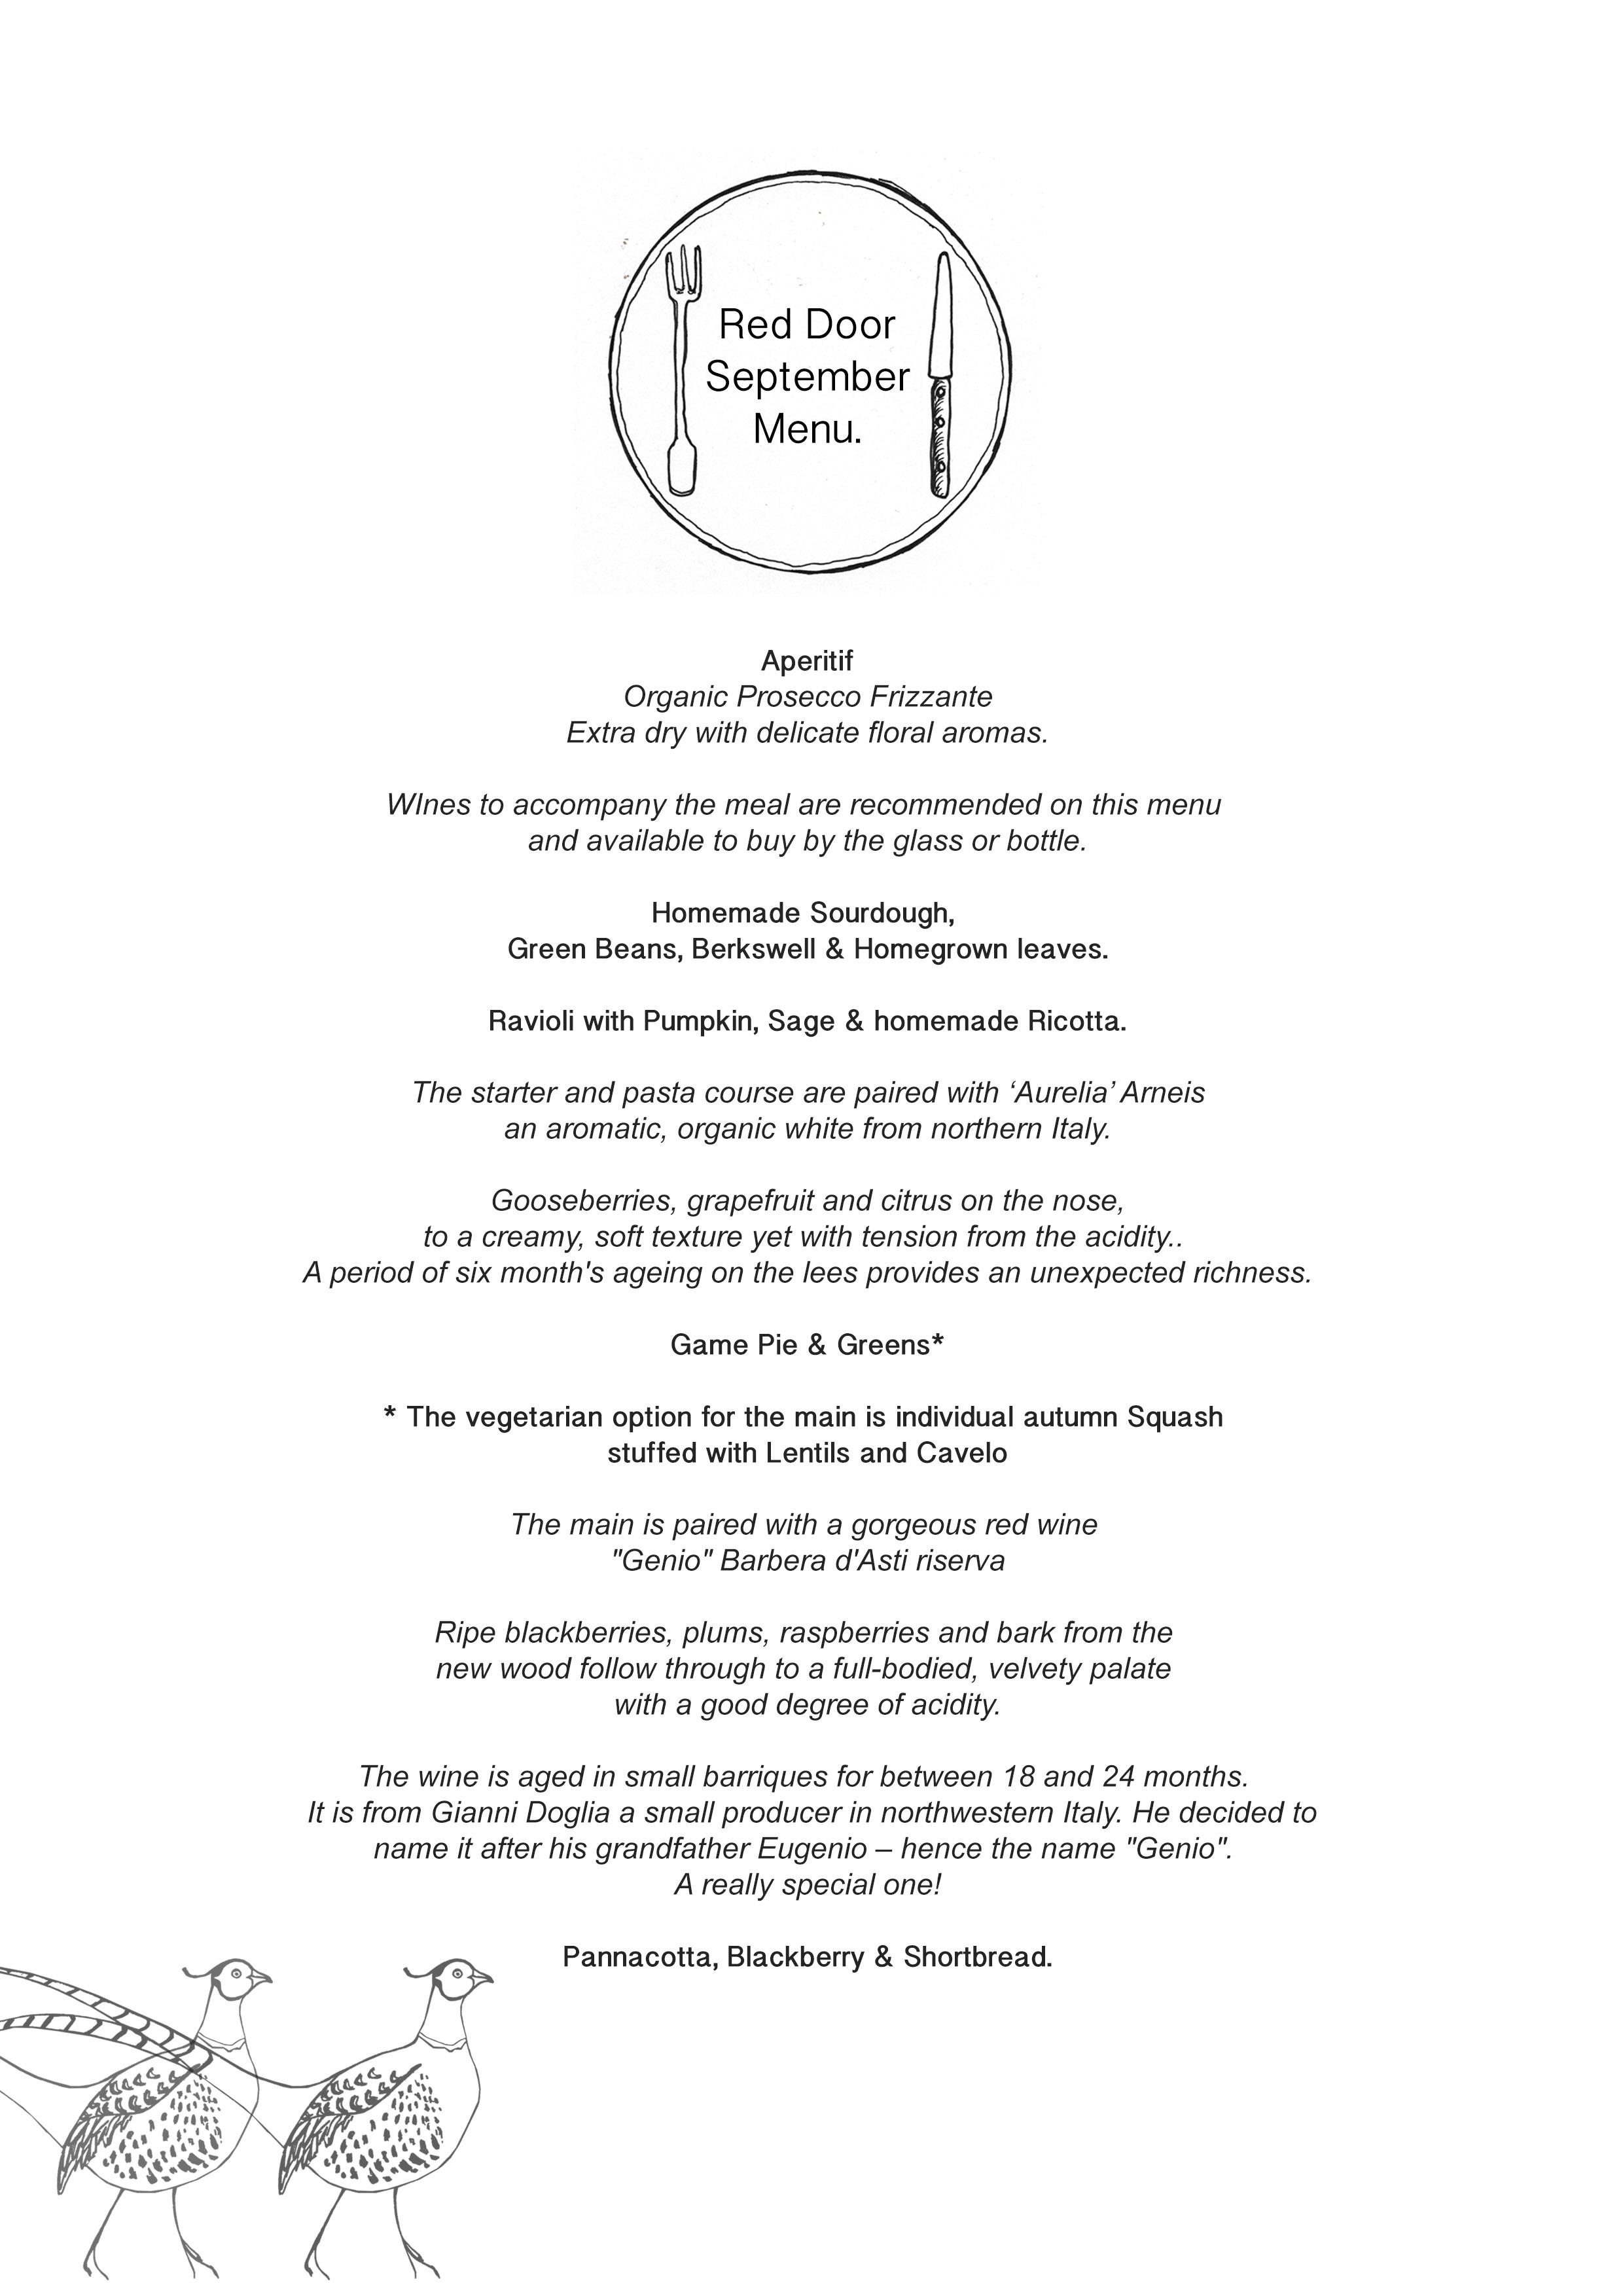 Red Door September menu with wine.jpg